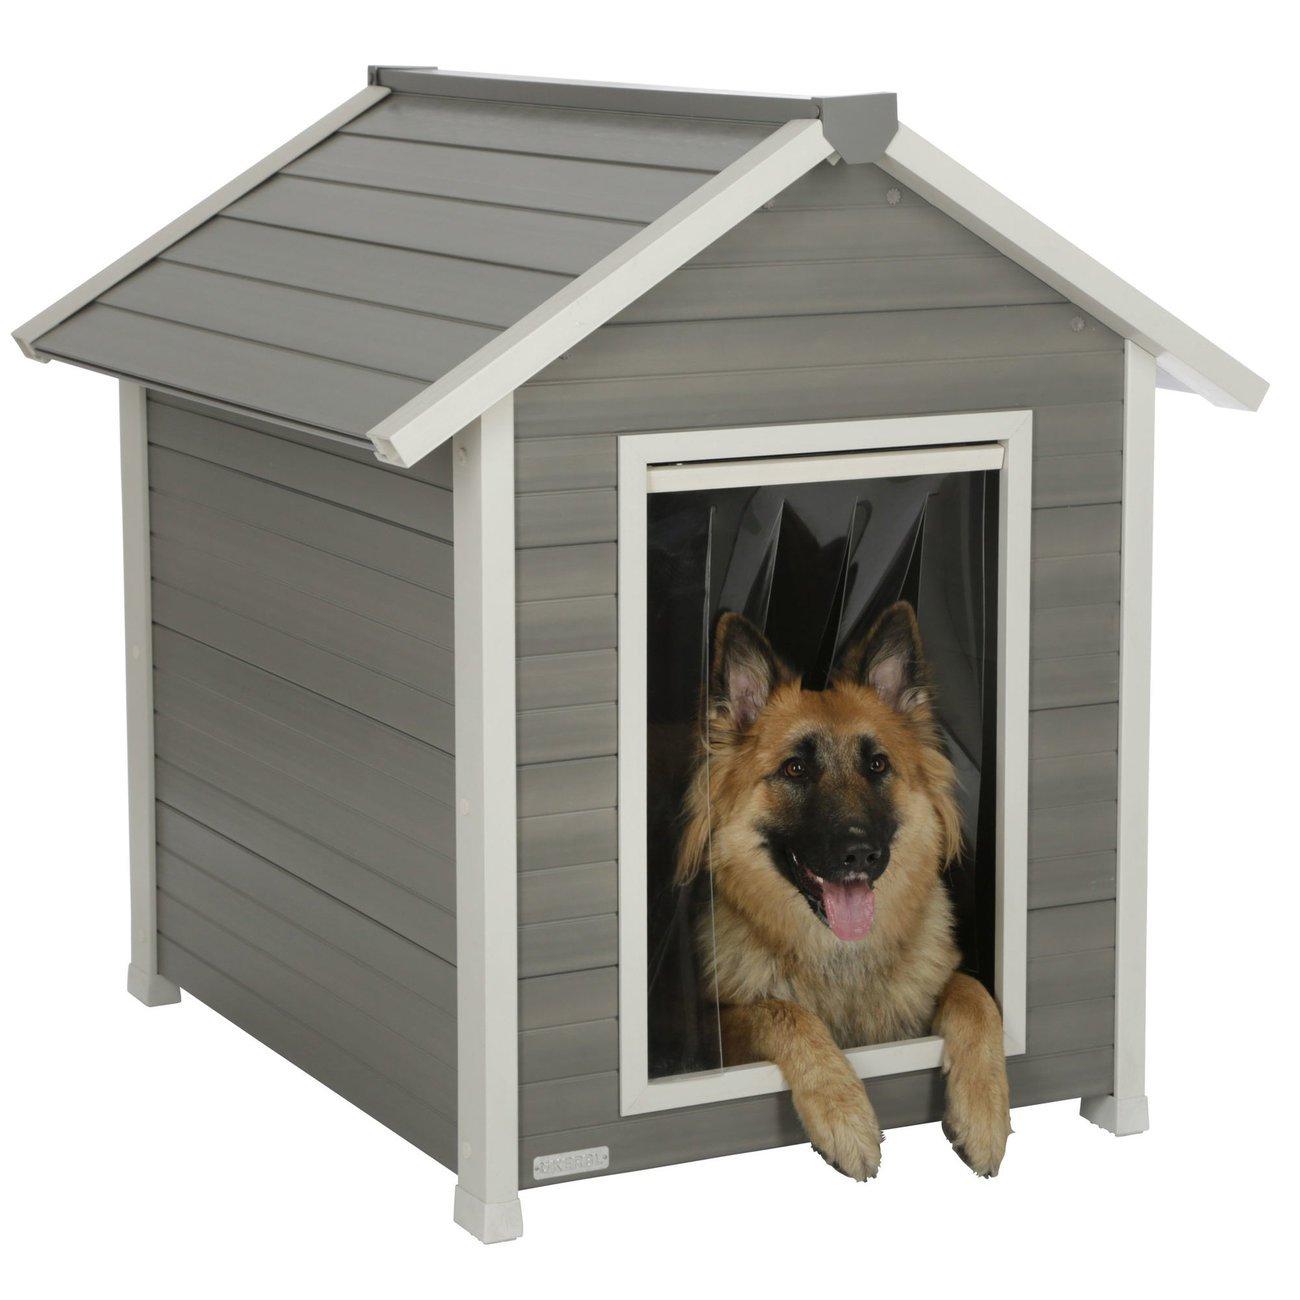 Kerbl Eco-Hundehütte Hendry, Bild 4